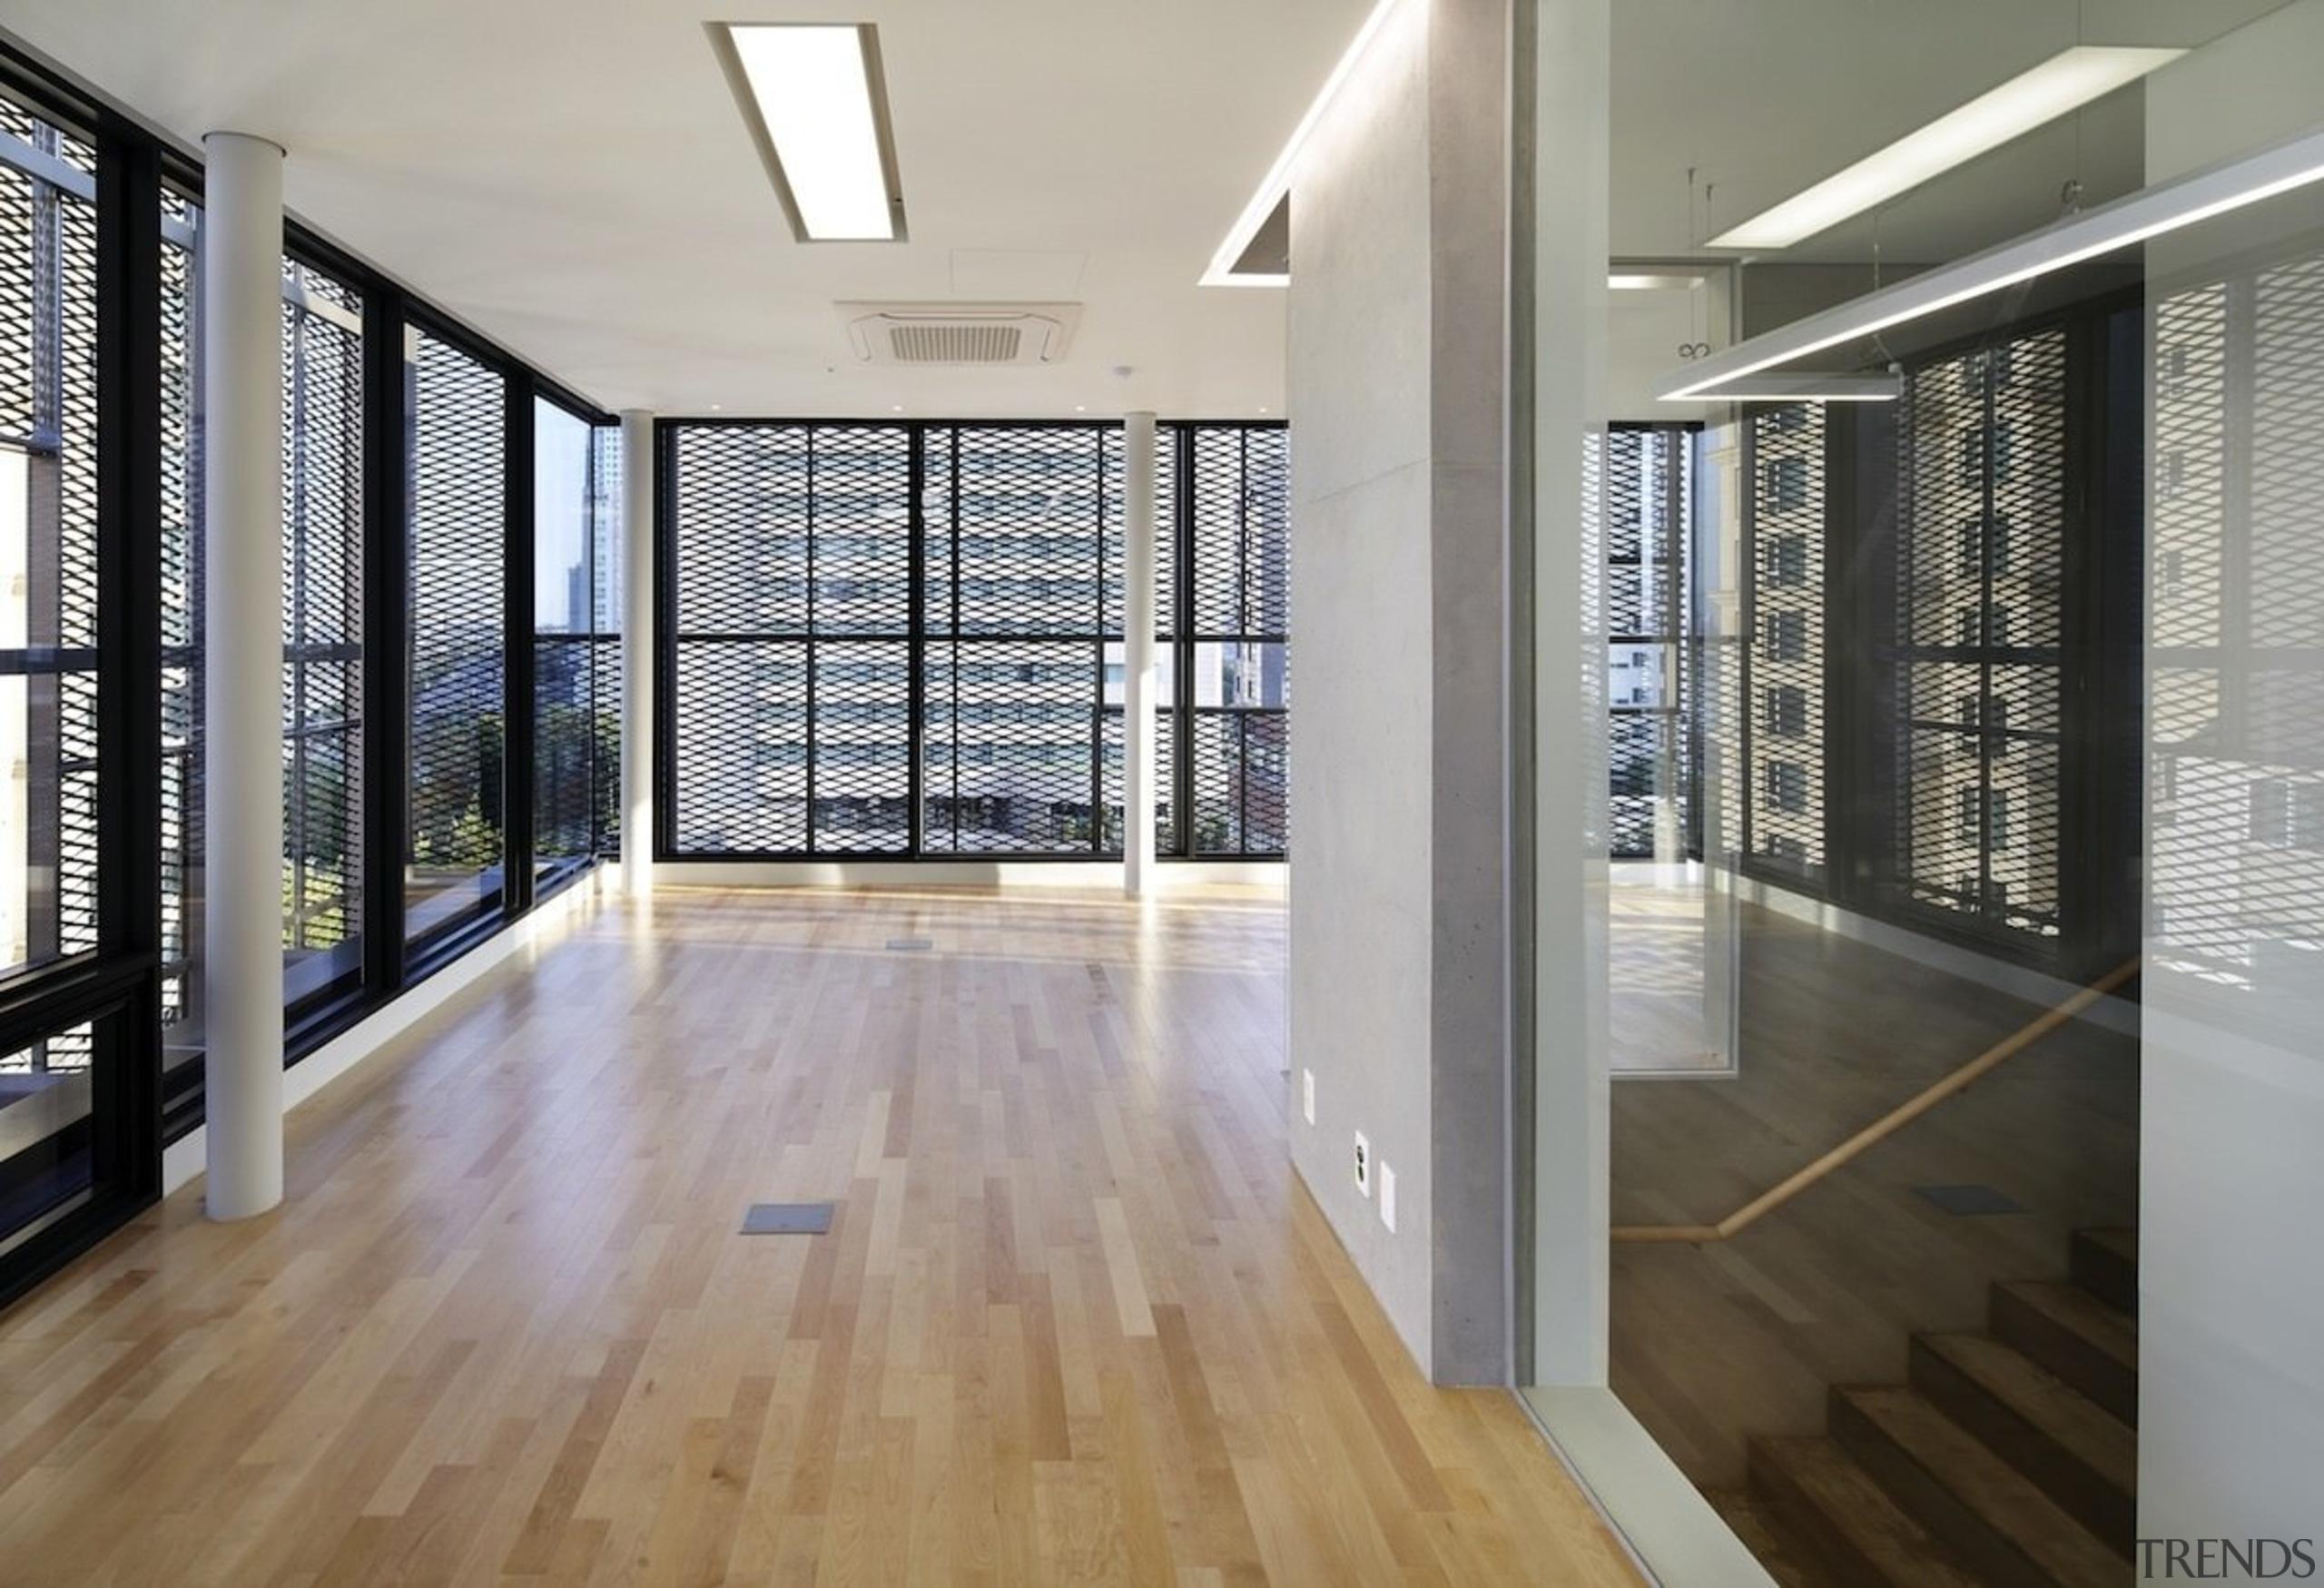 The 925 Building - The 925 Building - architecture, daylighting, estate, floor, flooring, handrail, hardwood, interior design, laminate flooring, real estate, wall, window, wood, wood flooring, gray